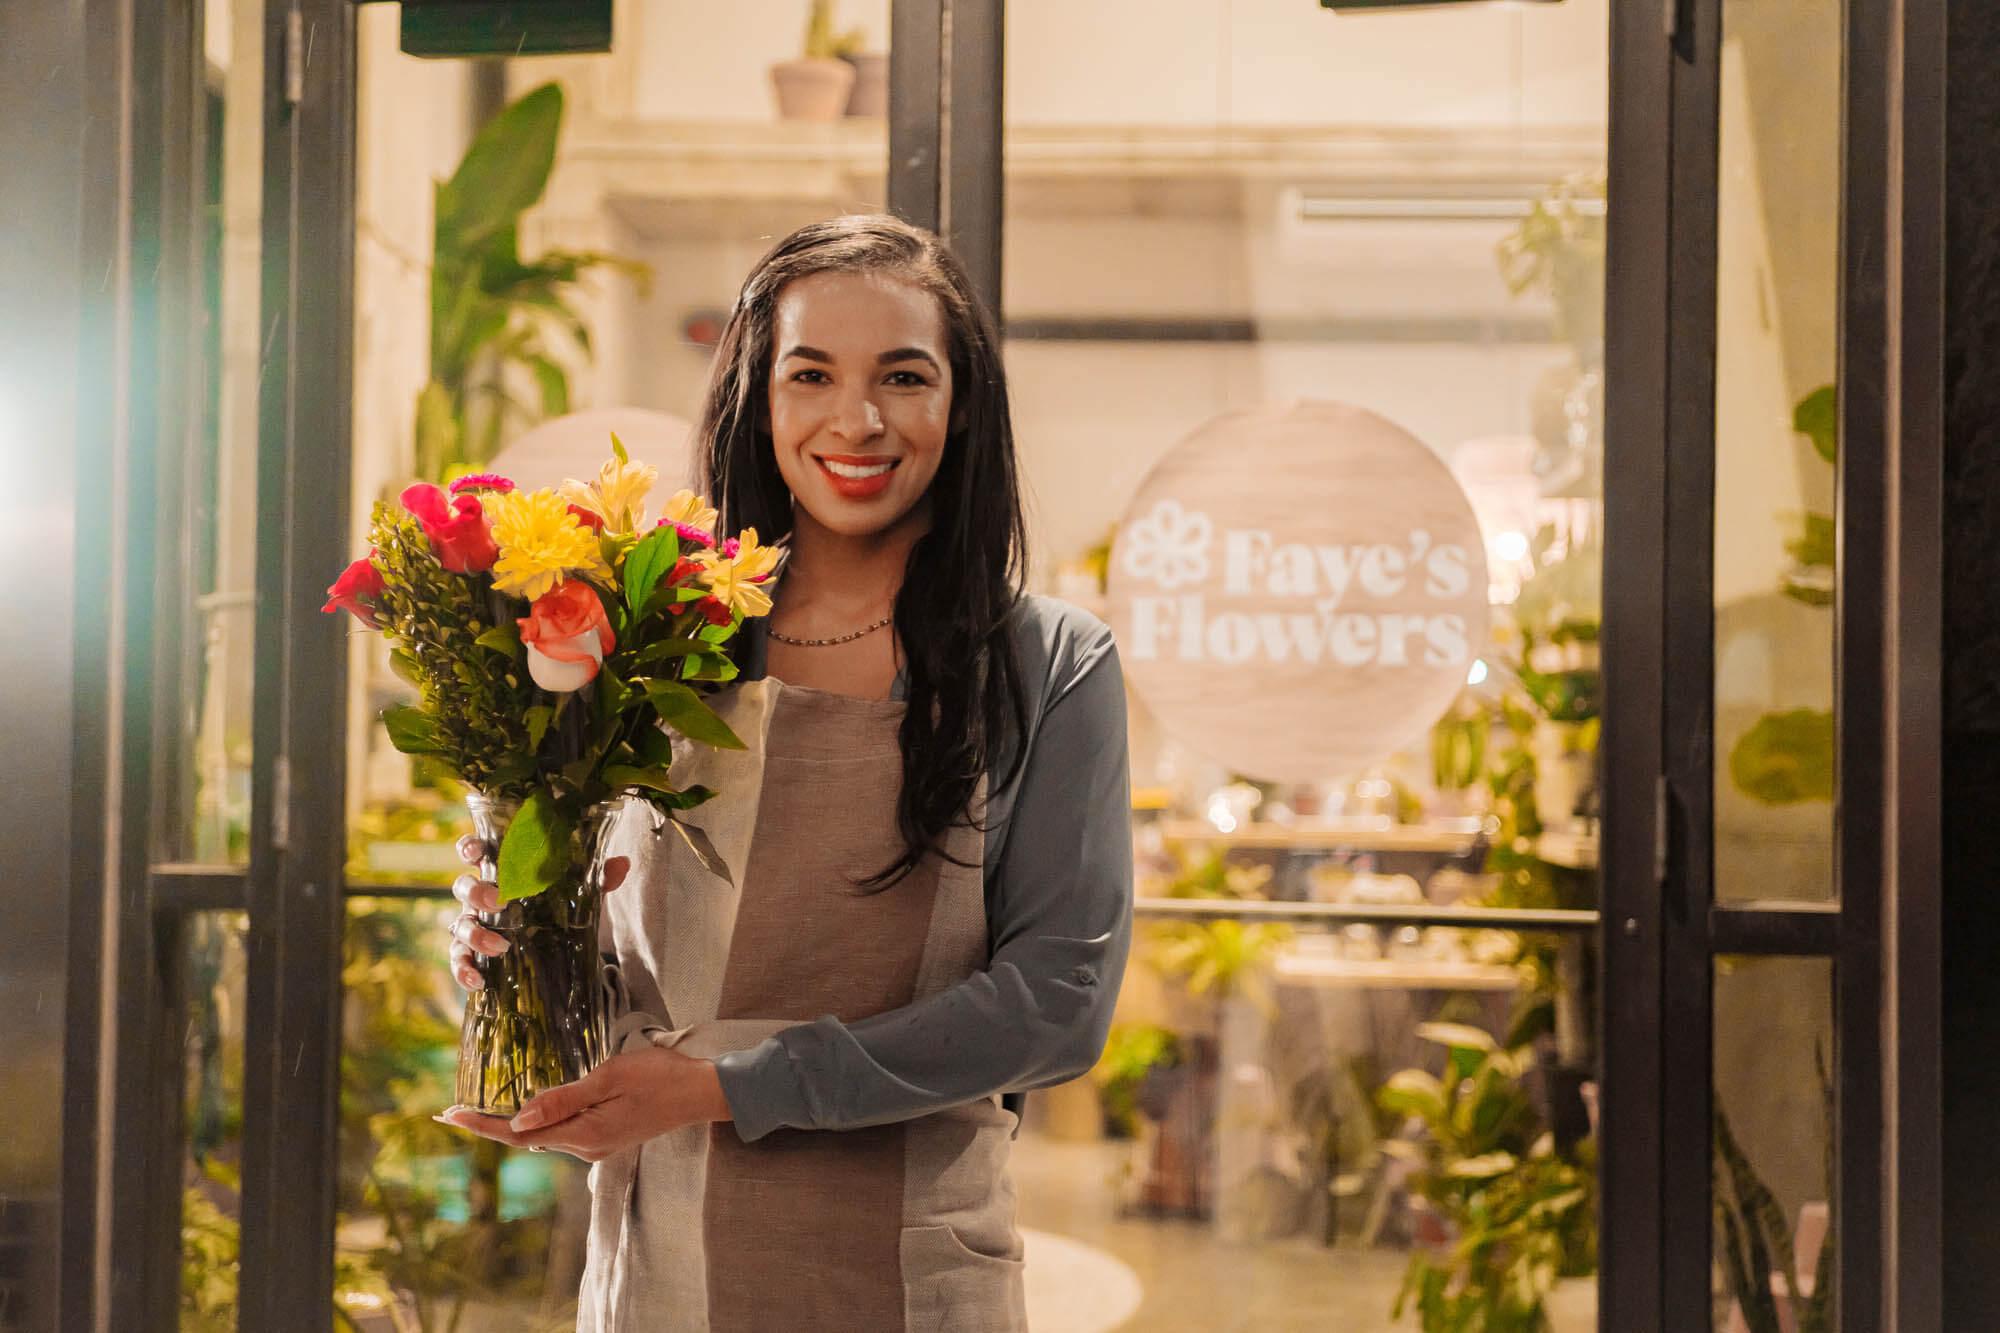 A florist holding flowers